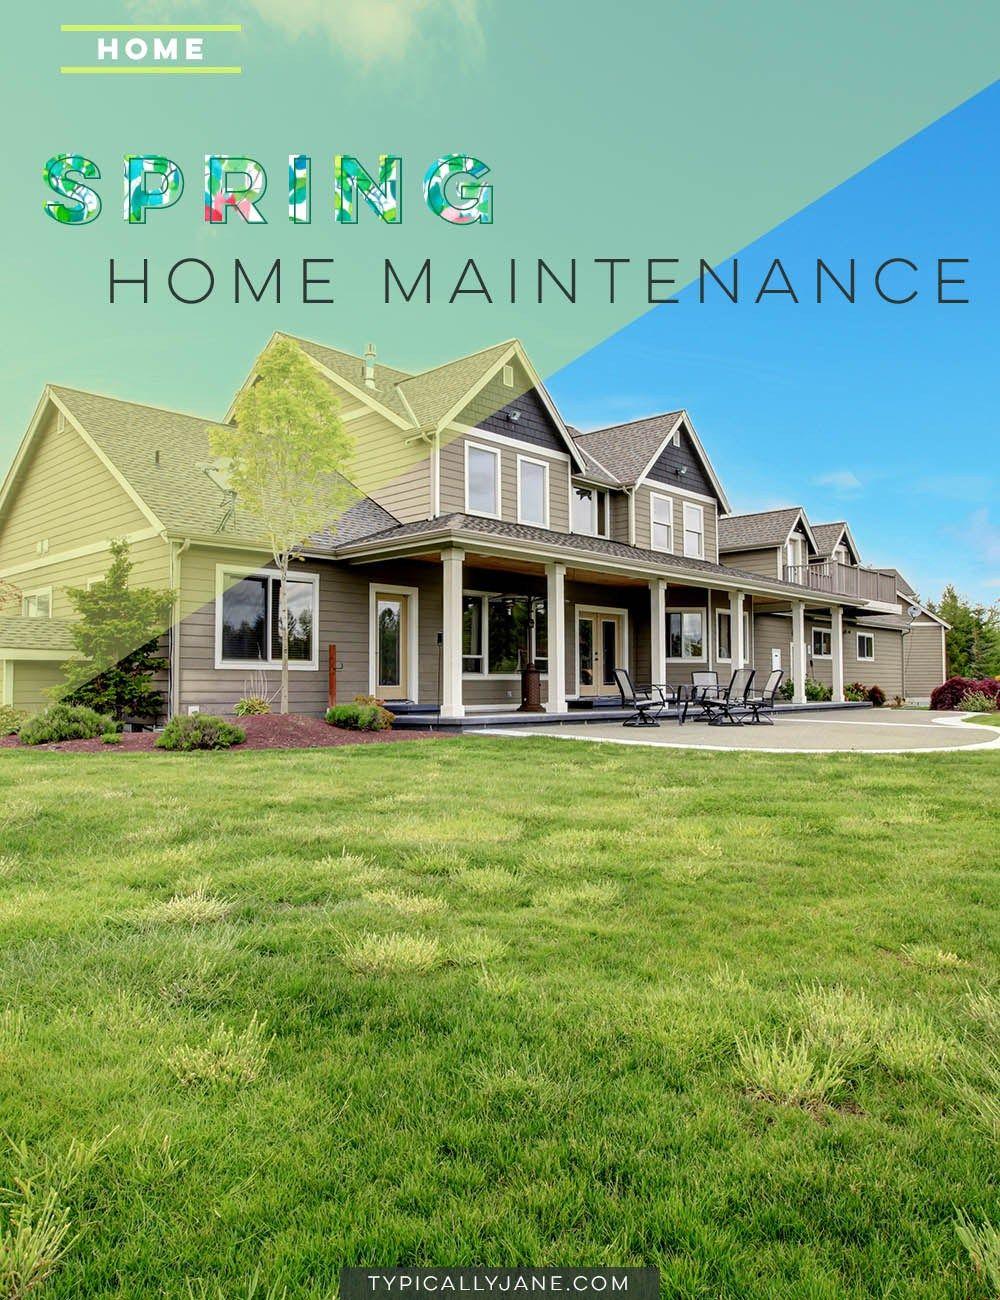 Photo of Spring Home Maintenance • In der Regel Jane